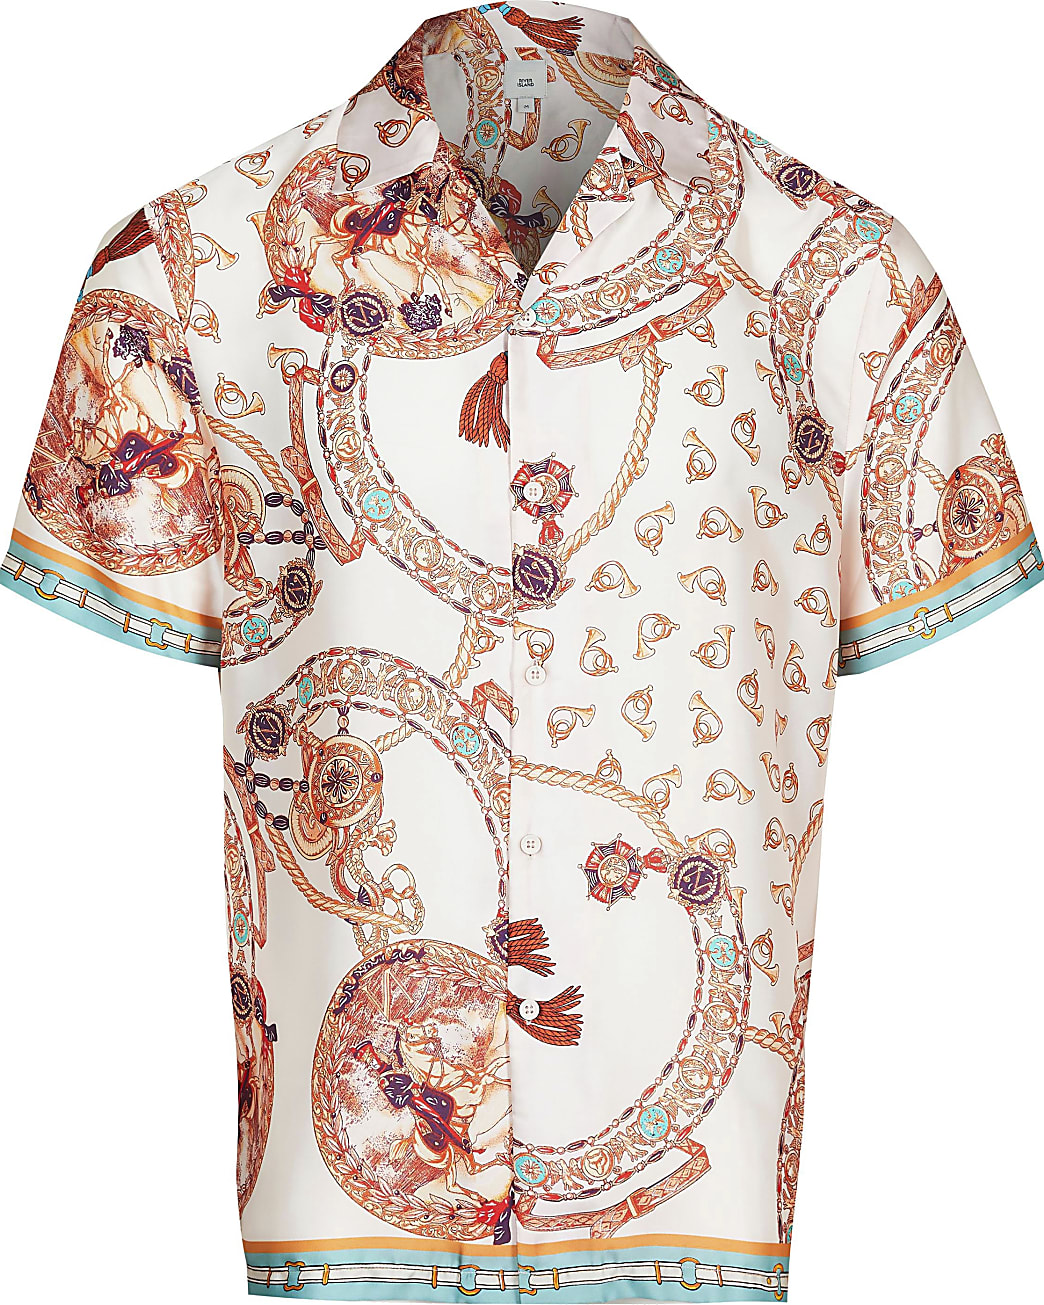 Big & Tall pink print short sleeve shirt